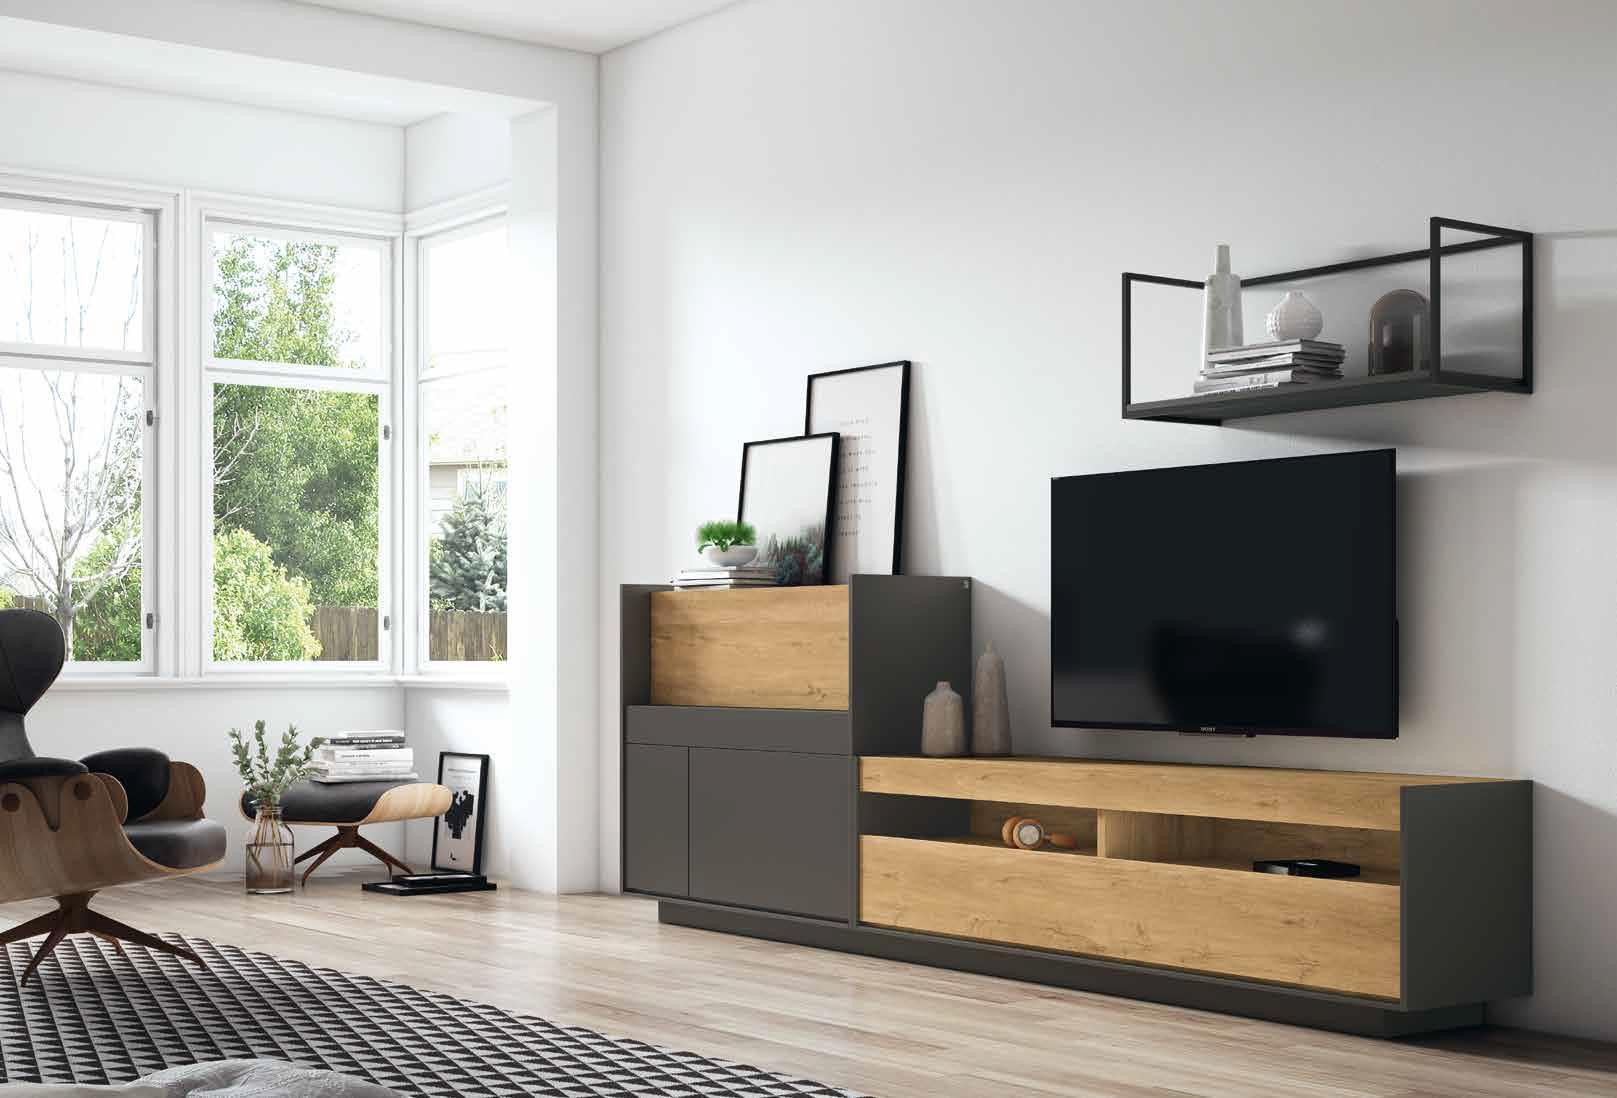 salon-moderno-Nativ-2019-muebles-paco-caballero-0920-5c8ceaaeca0a8